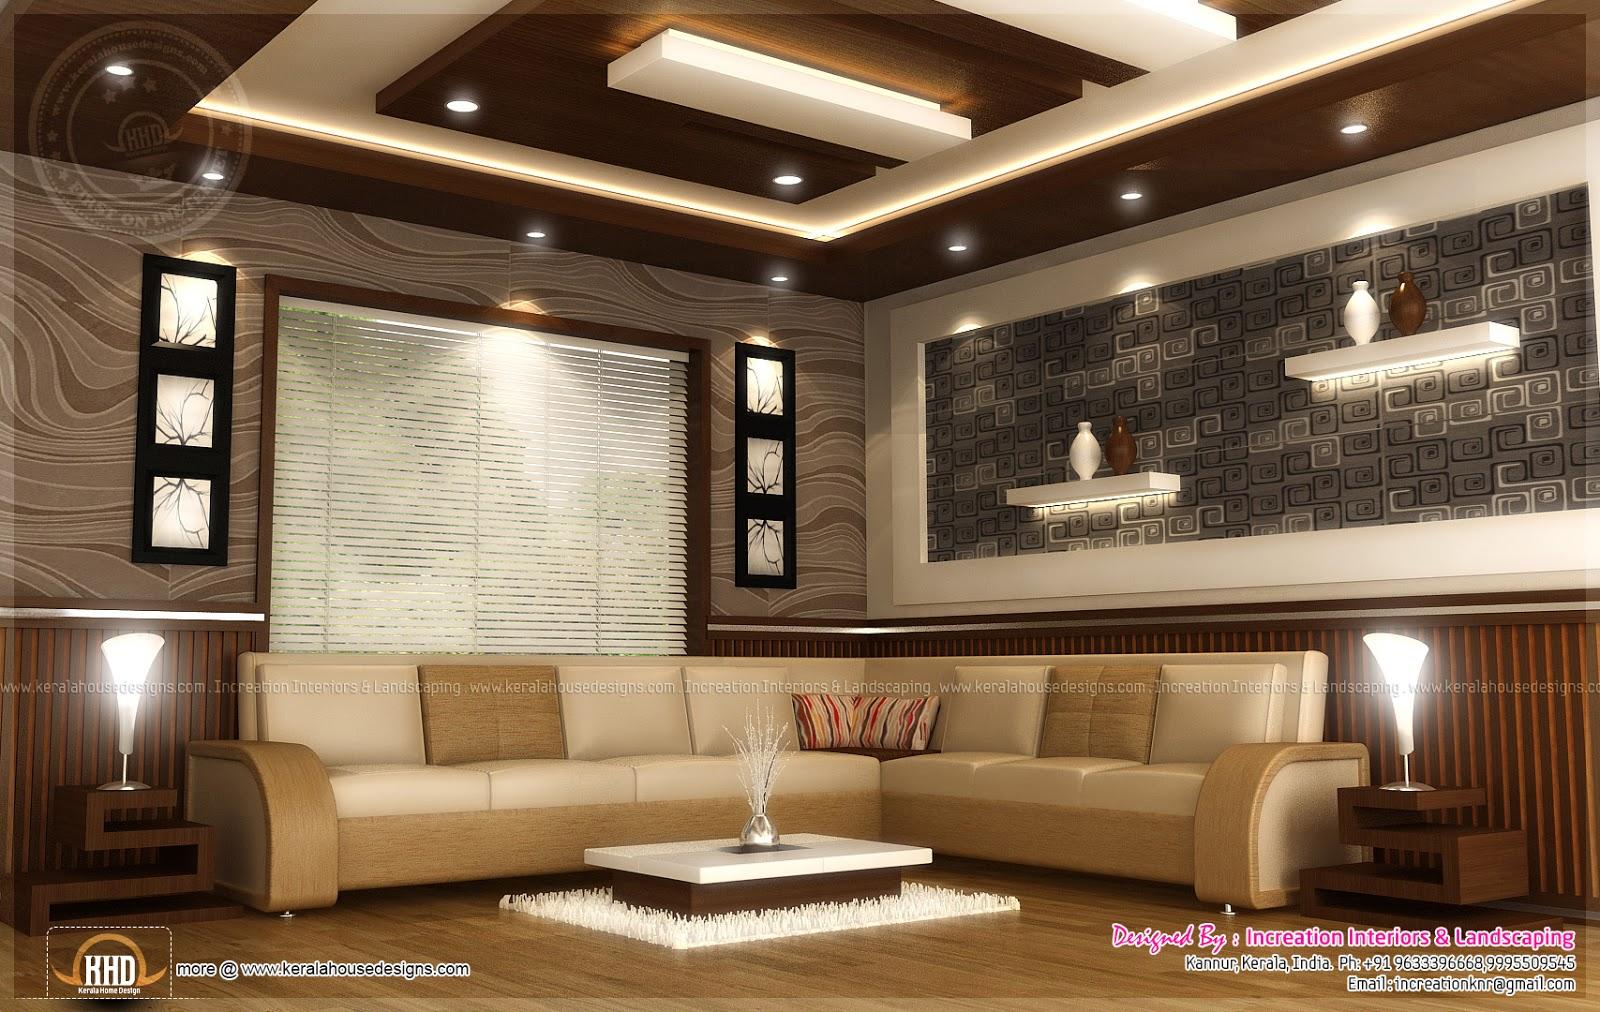 Full hd home interior design kannur of app smartphone by increation newbrough